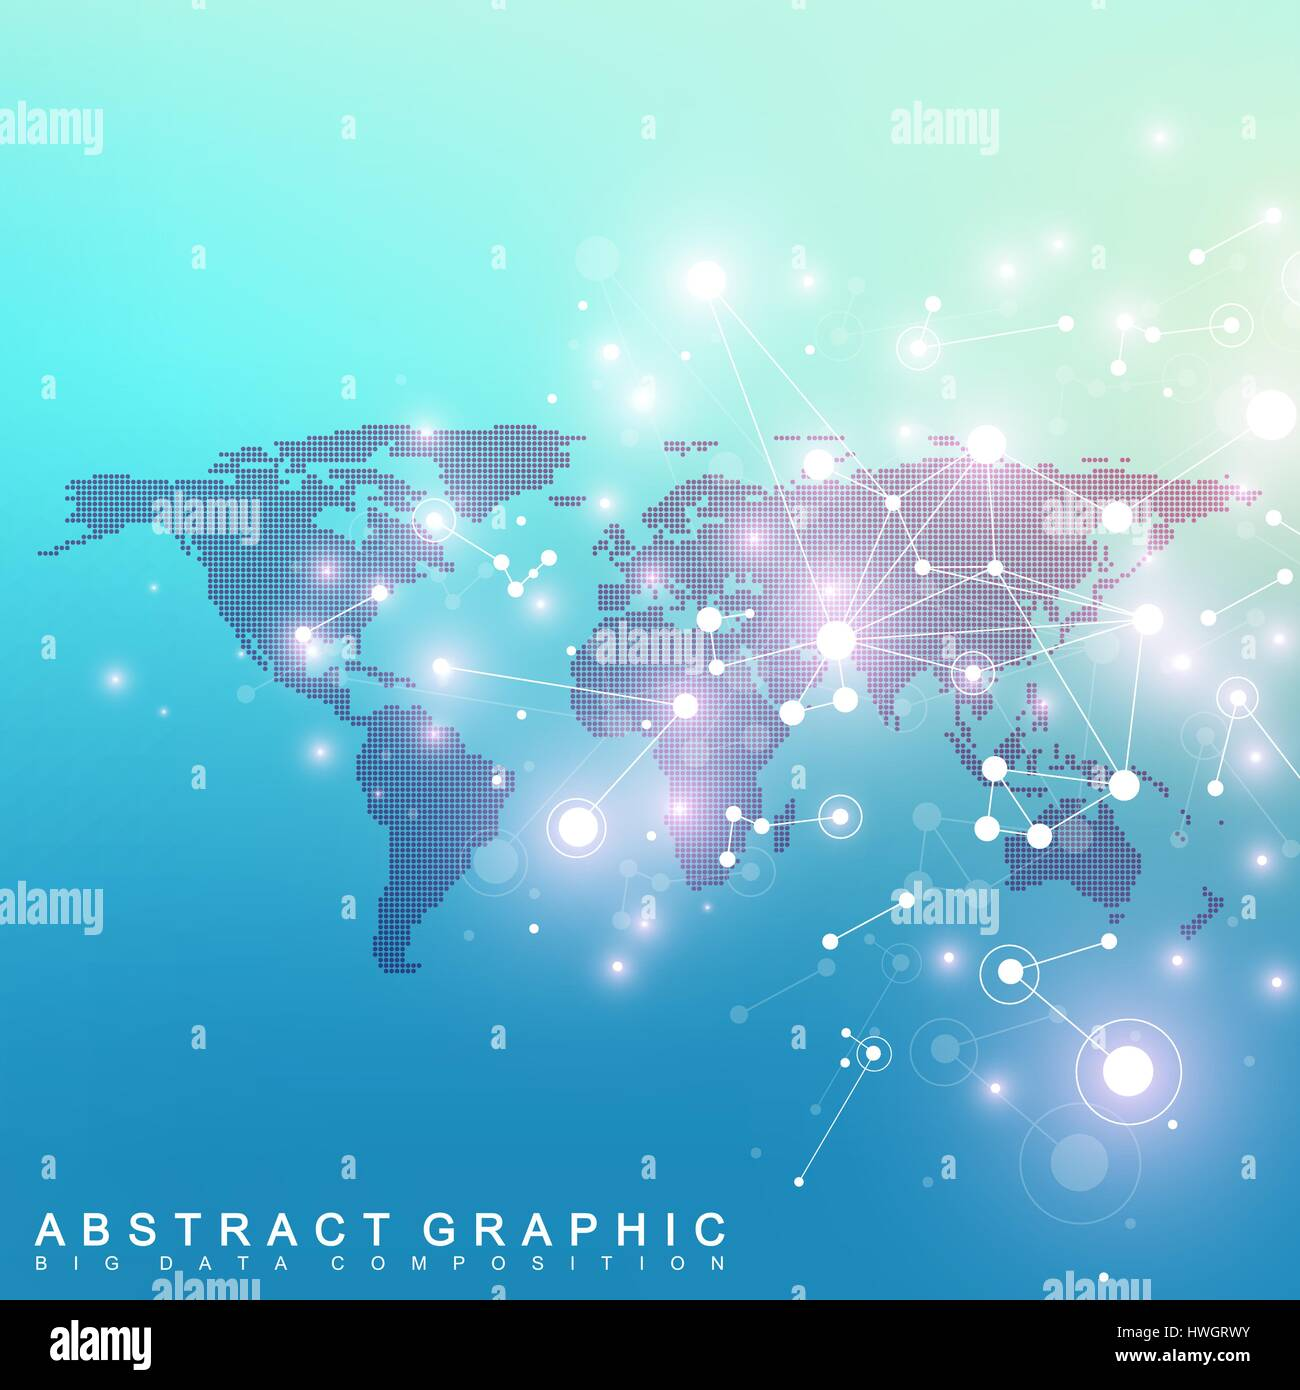 Geometric graphic background communication with dotted world map geometric graphic background communication with dotted world map big data complex particle compounds network connection lines plexus gumiabroncs Gallery